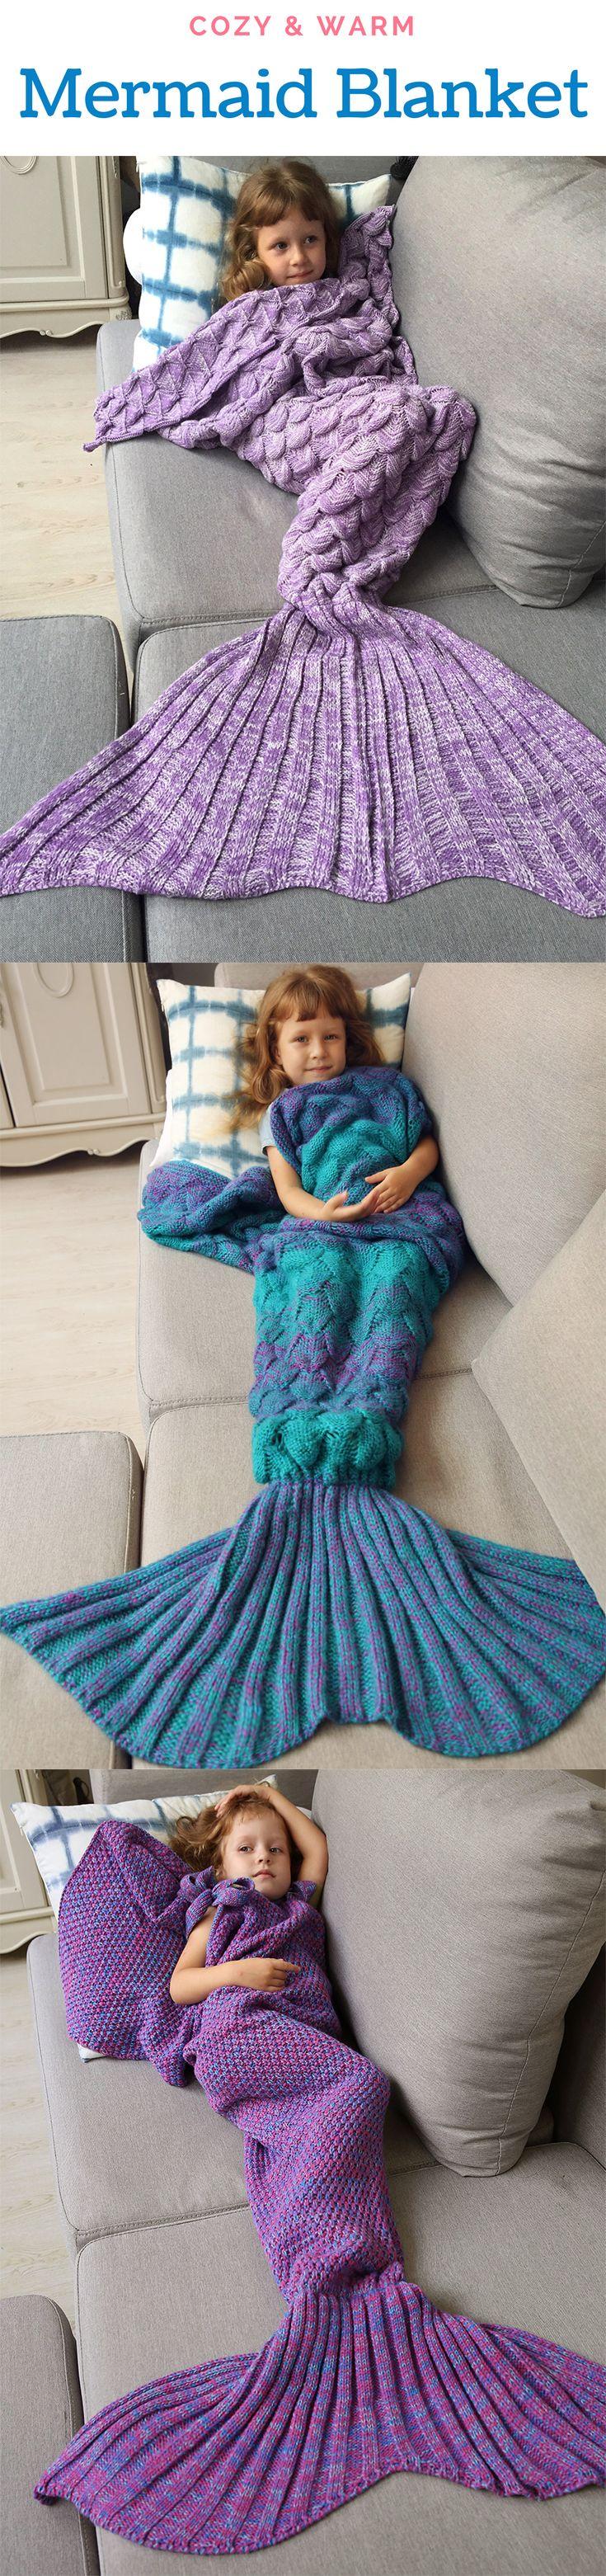 Mermaid Blankets for Kids  From $7.99  Sammydress.com   #BlackFriday